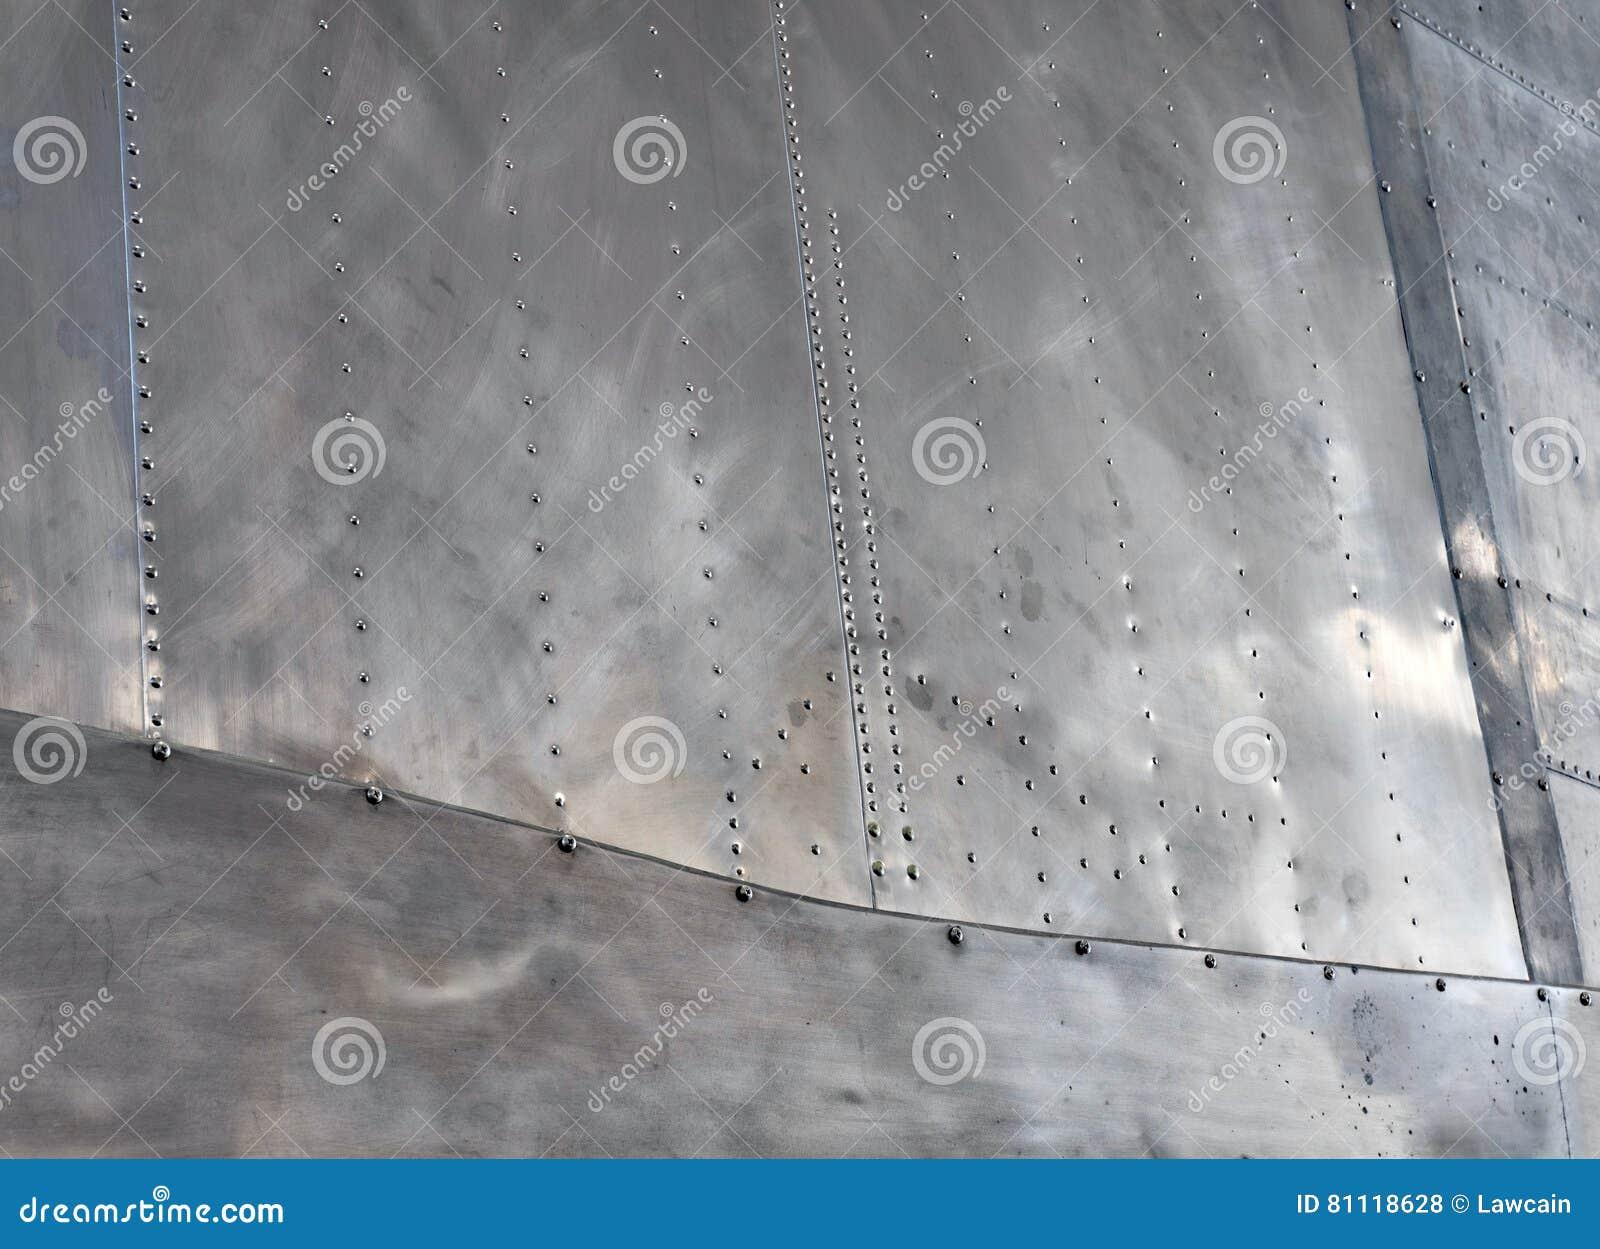 Memphis Belle Riveted Aluminum Fuselage-Close-up